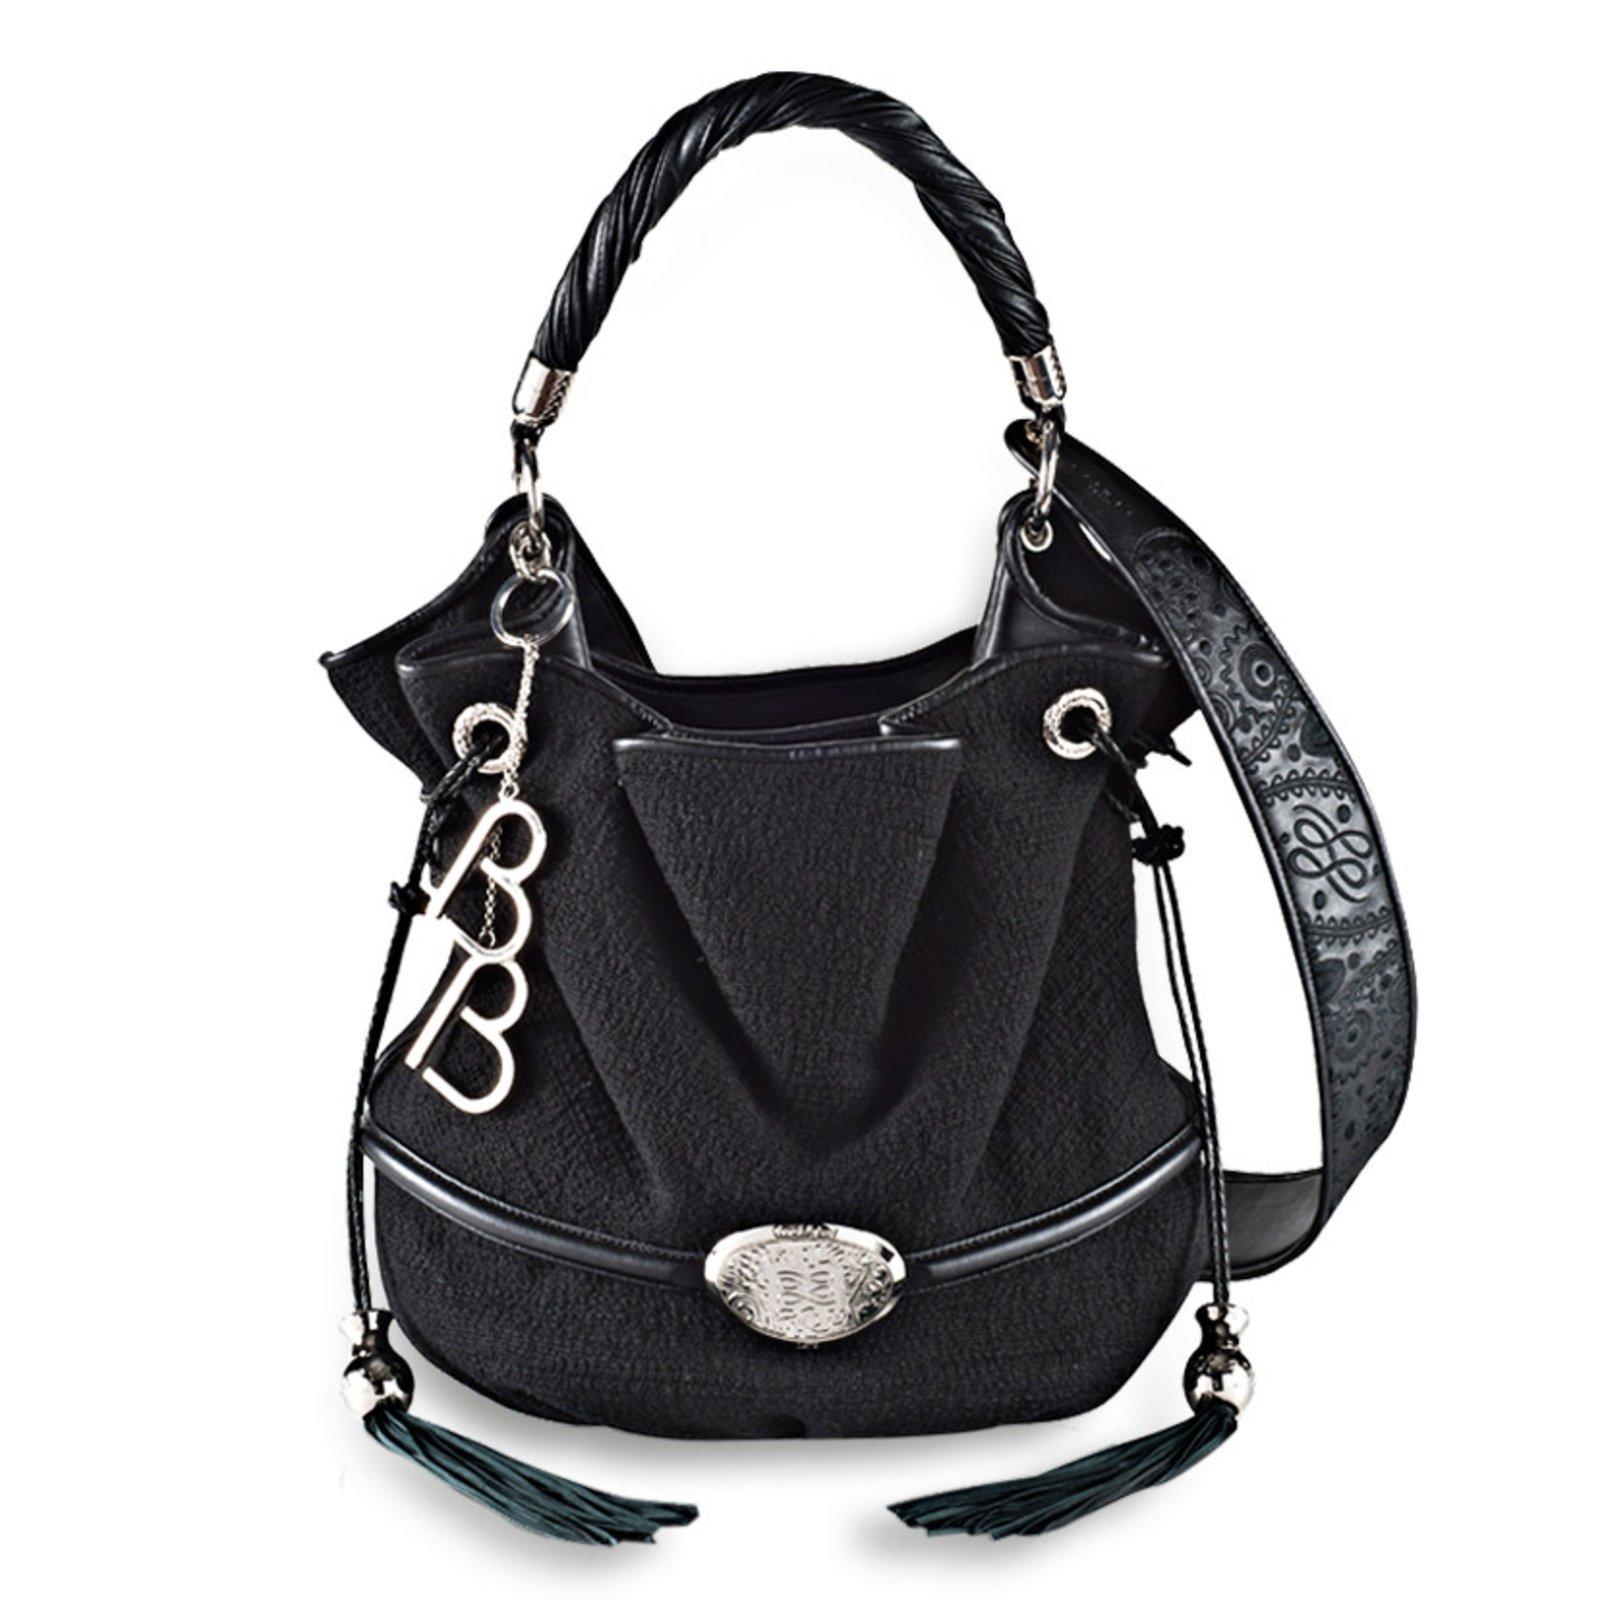 39584580234b Lancel Handbag Handbags Leather Other Ref 28641 Joli Closet